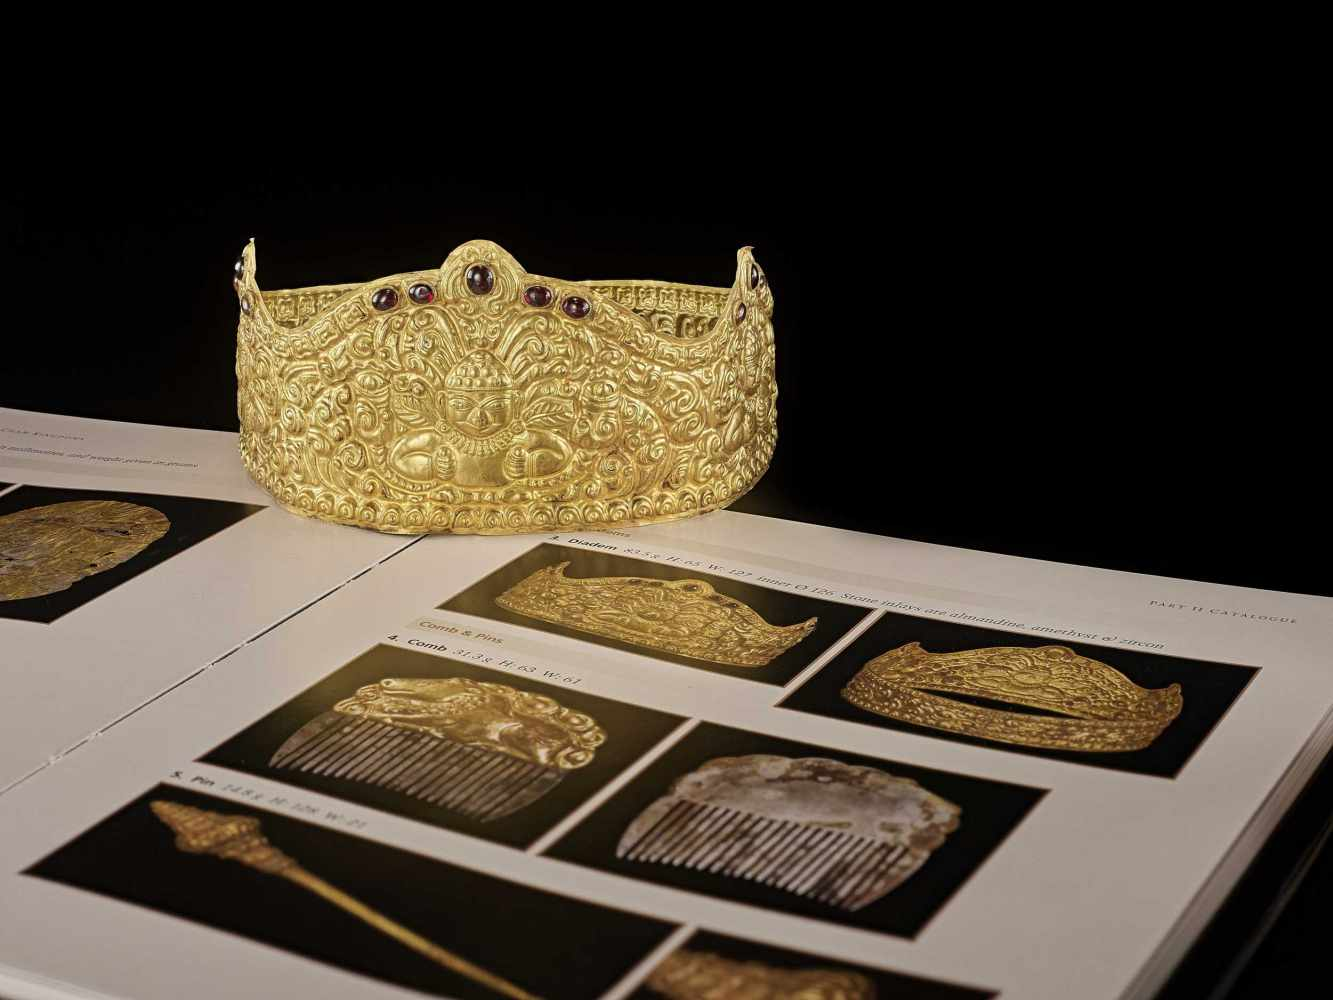 AN EXTRE MELY RARE AND FINE CHAM GEMSTONE-SET GOLD REPOUSSÉ CROWN WITH GARUDAS - Bild 2 aus 9